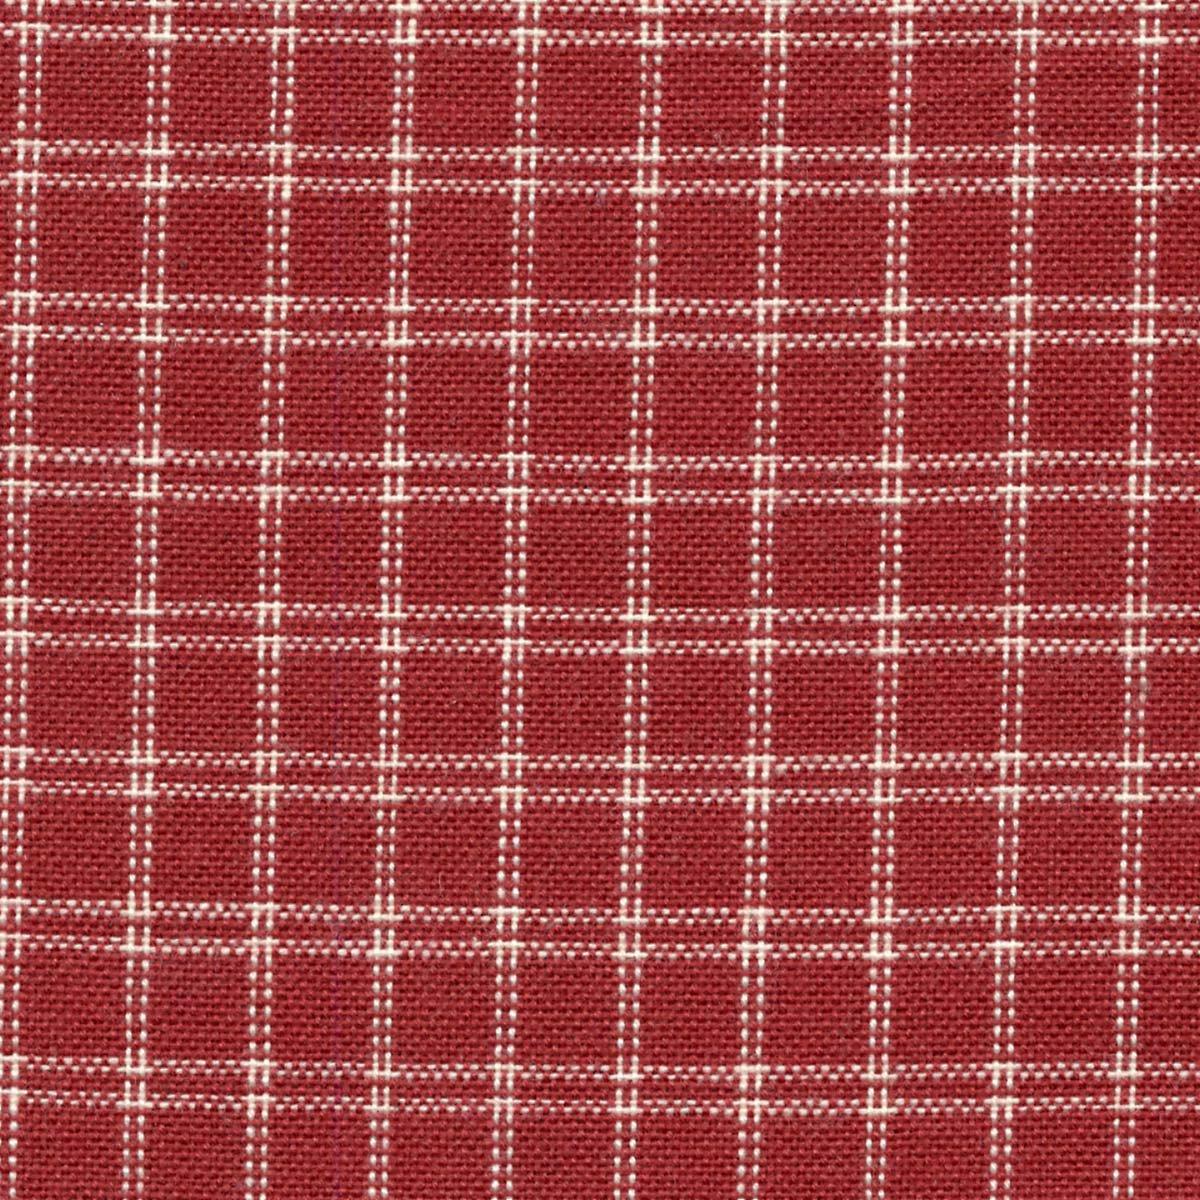 Dunroven House Cream Windowpane Plain Weave Towel-Red